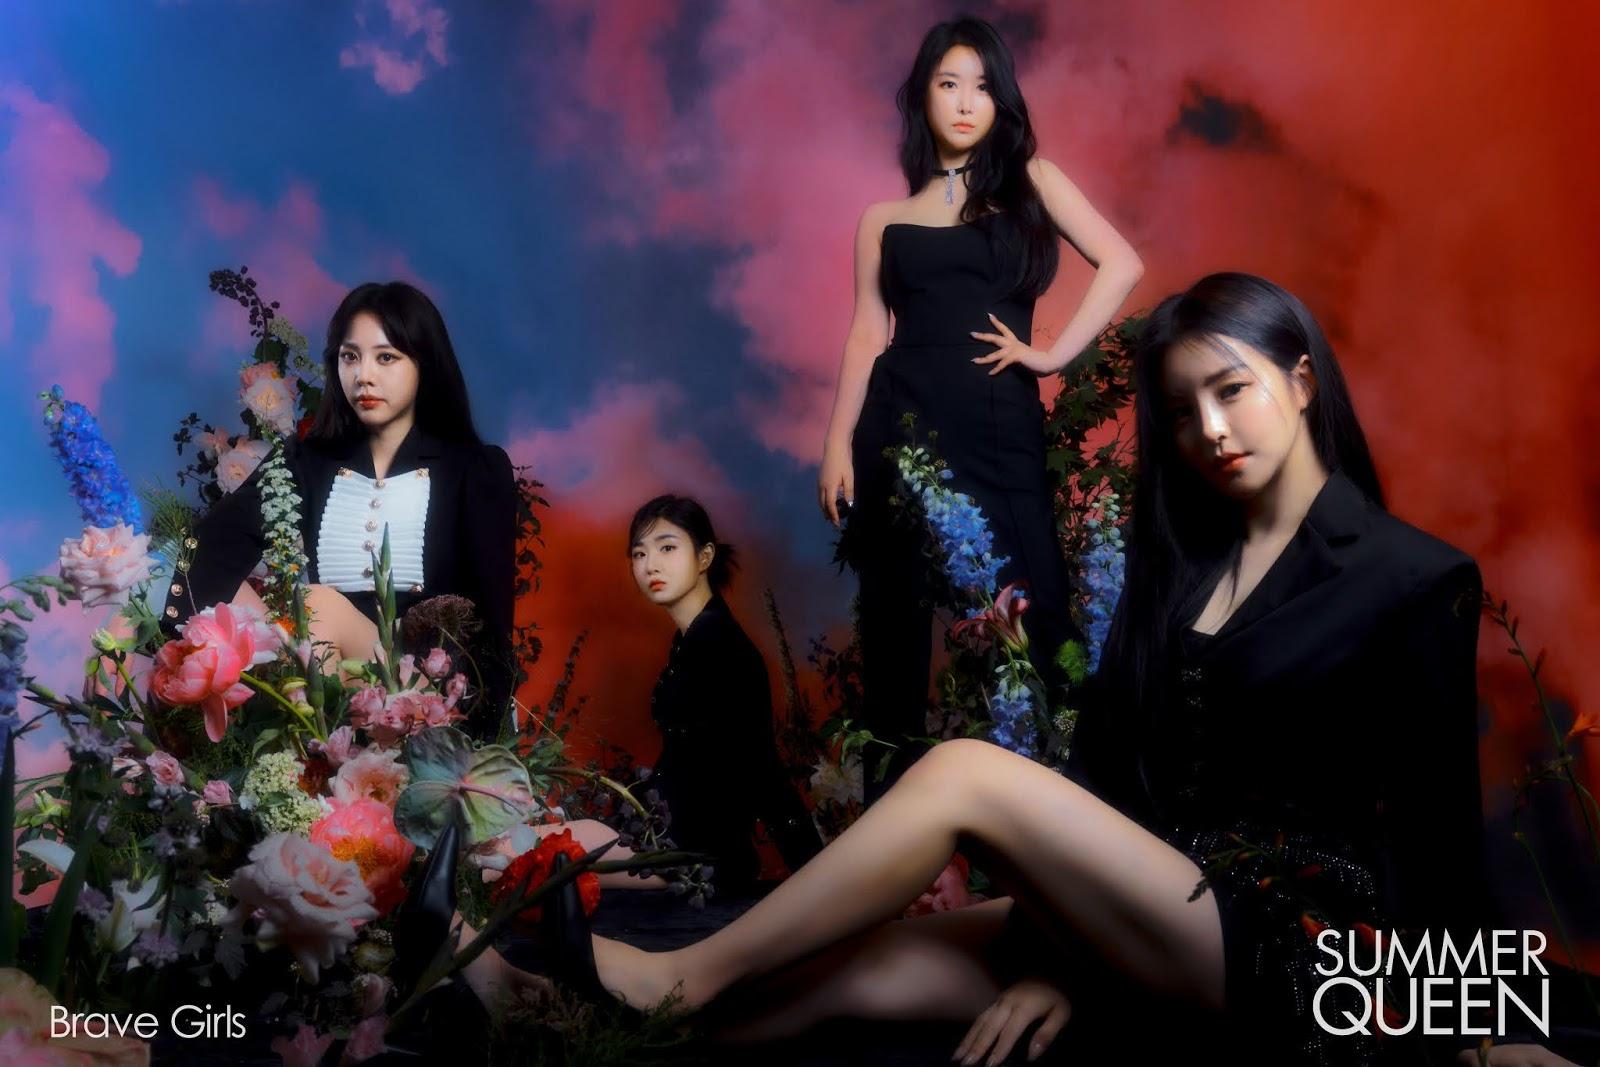 Summer Queen, el gran comeback de Brave Girls